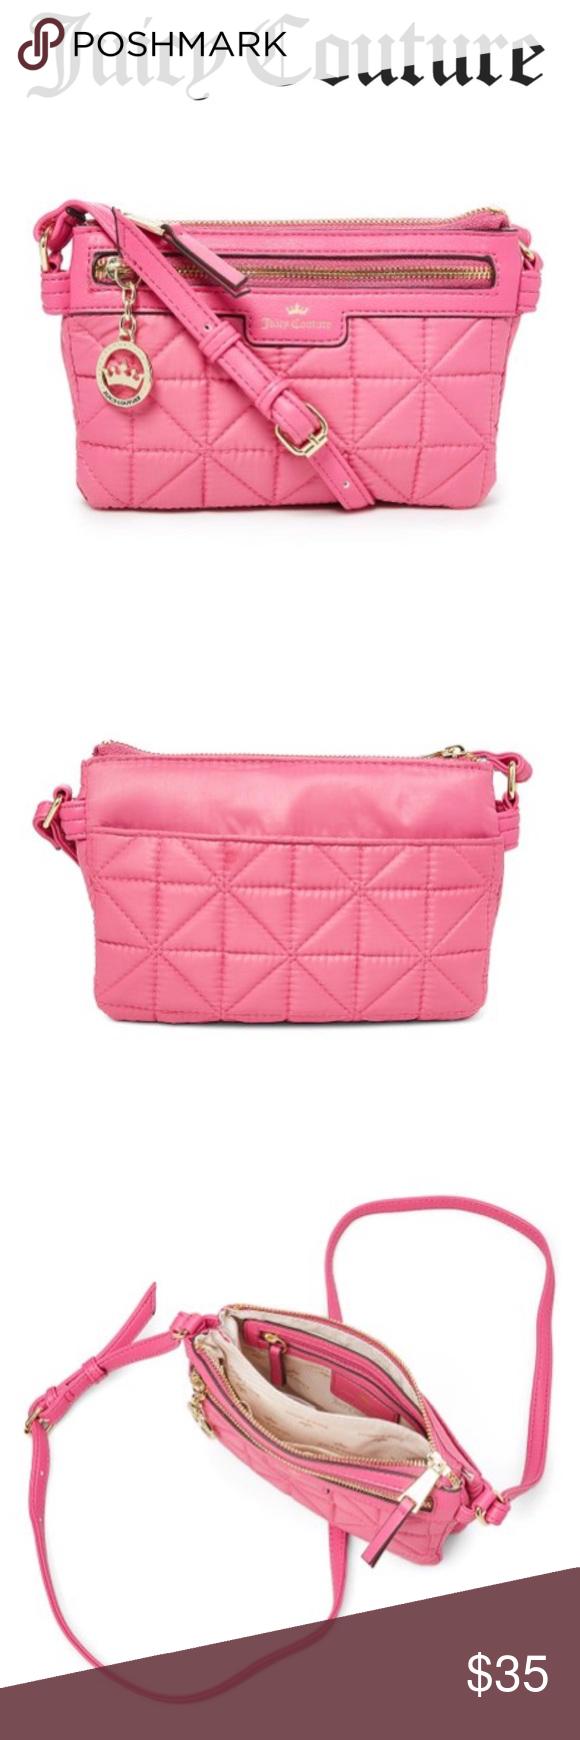 cab8434bc2 Juicy Couture Crown Jewel Crossbody Bag NWT. Flamingo pink. Quilted.  Medium. Juicy